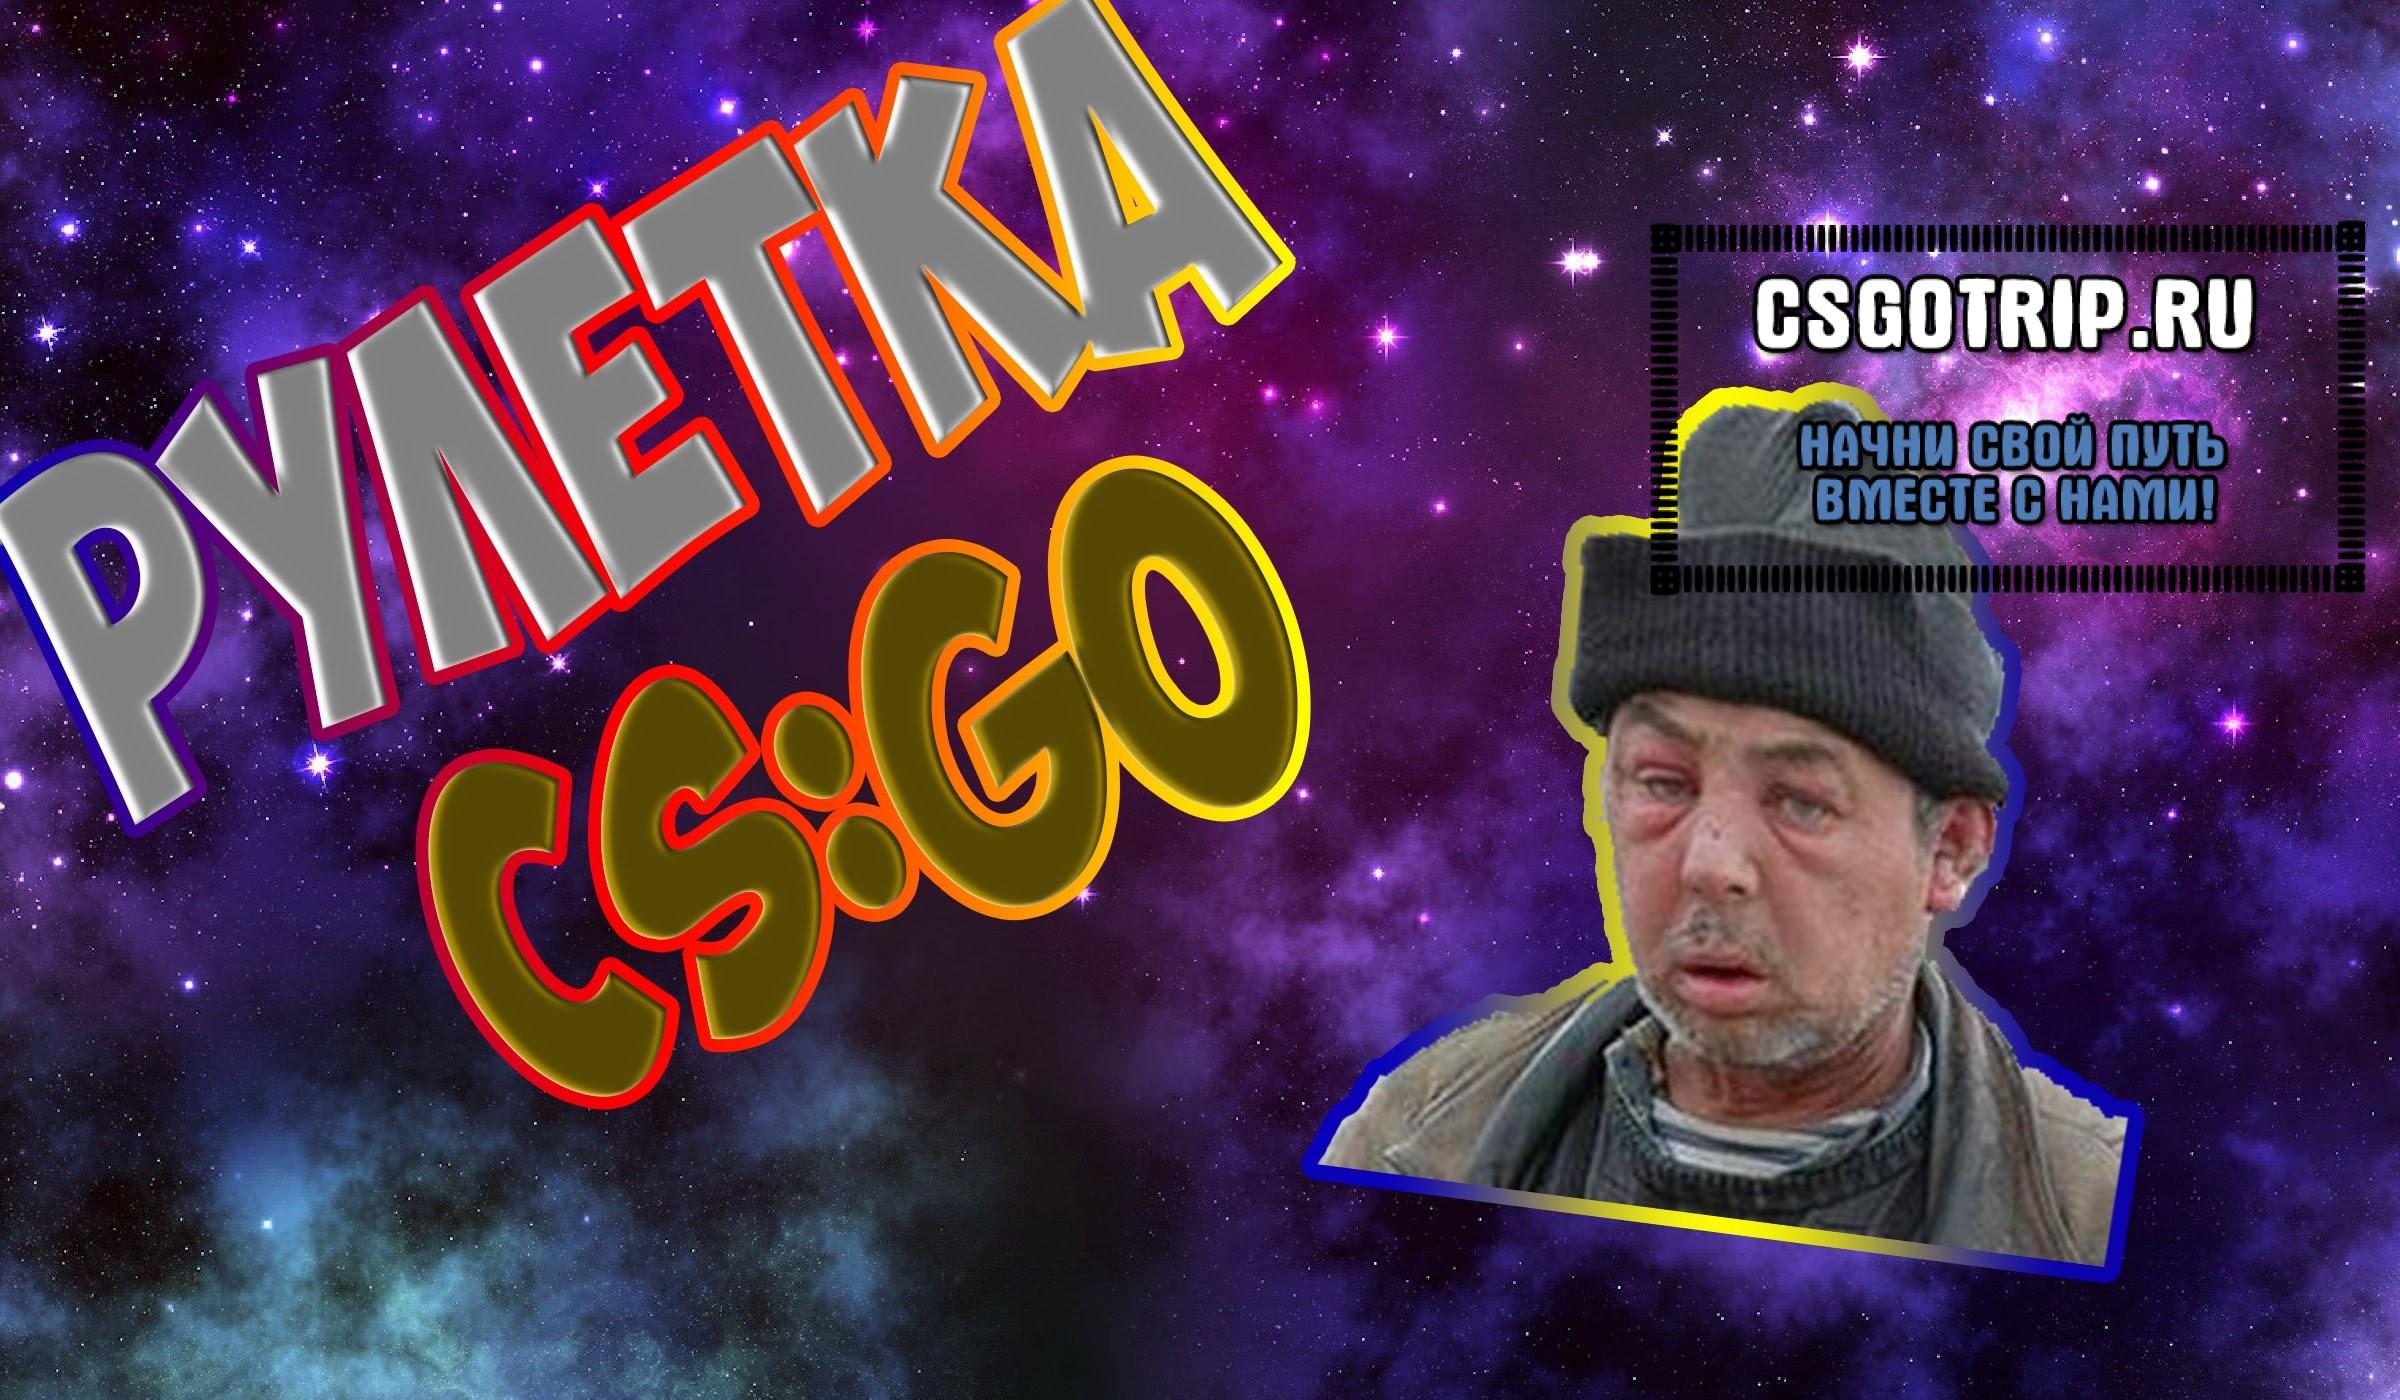 Cs go ghetto рулетка bot 9 csgopolygon steam